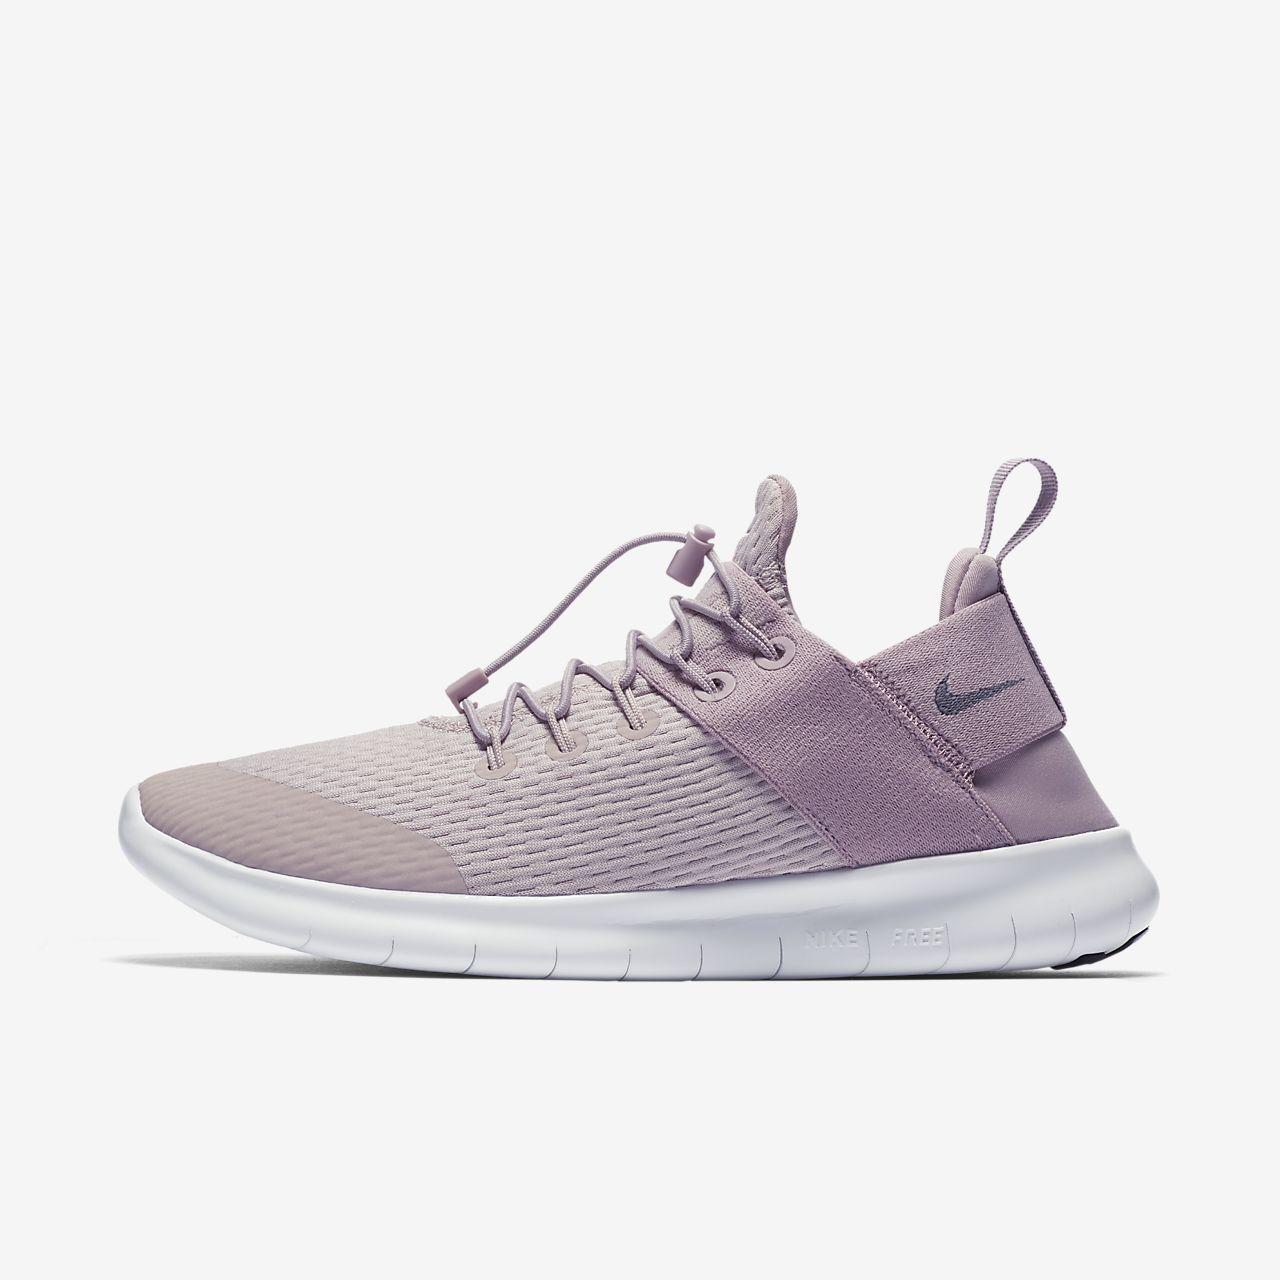 Nike Free RN 2018 Noir-Beige - Chaussures Baskets basses Homme